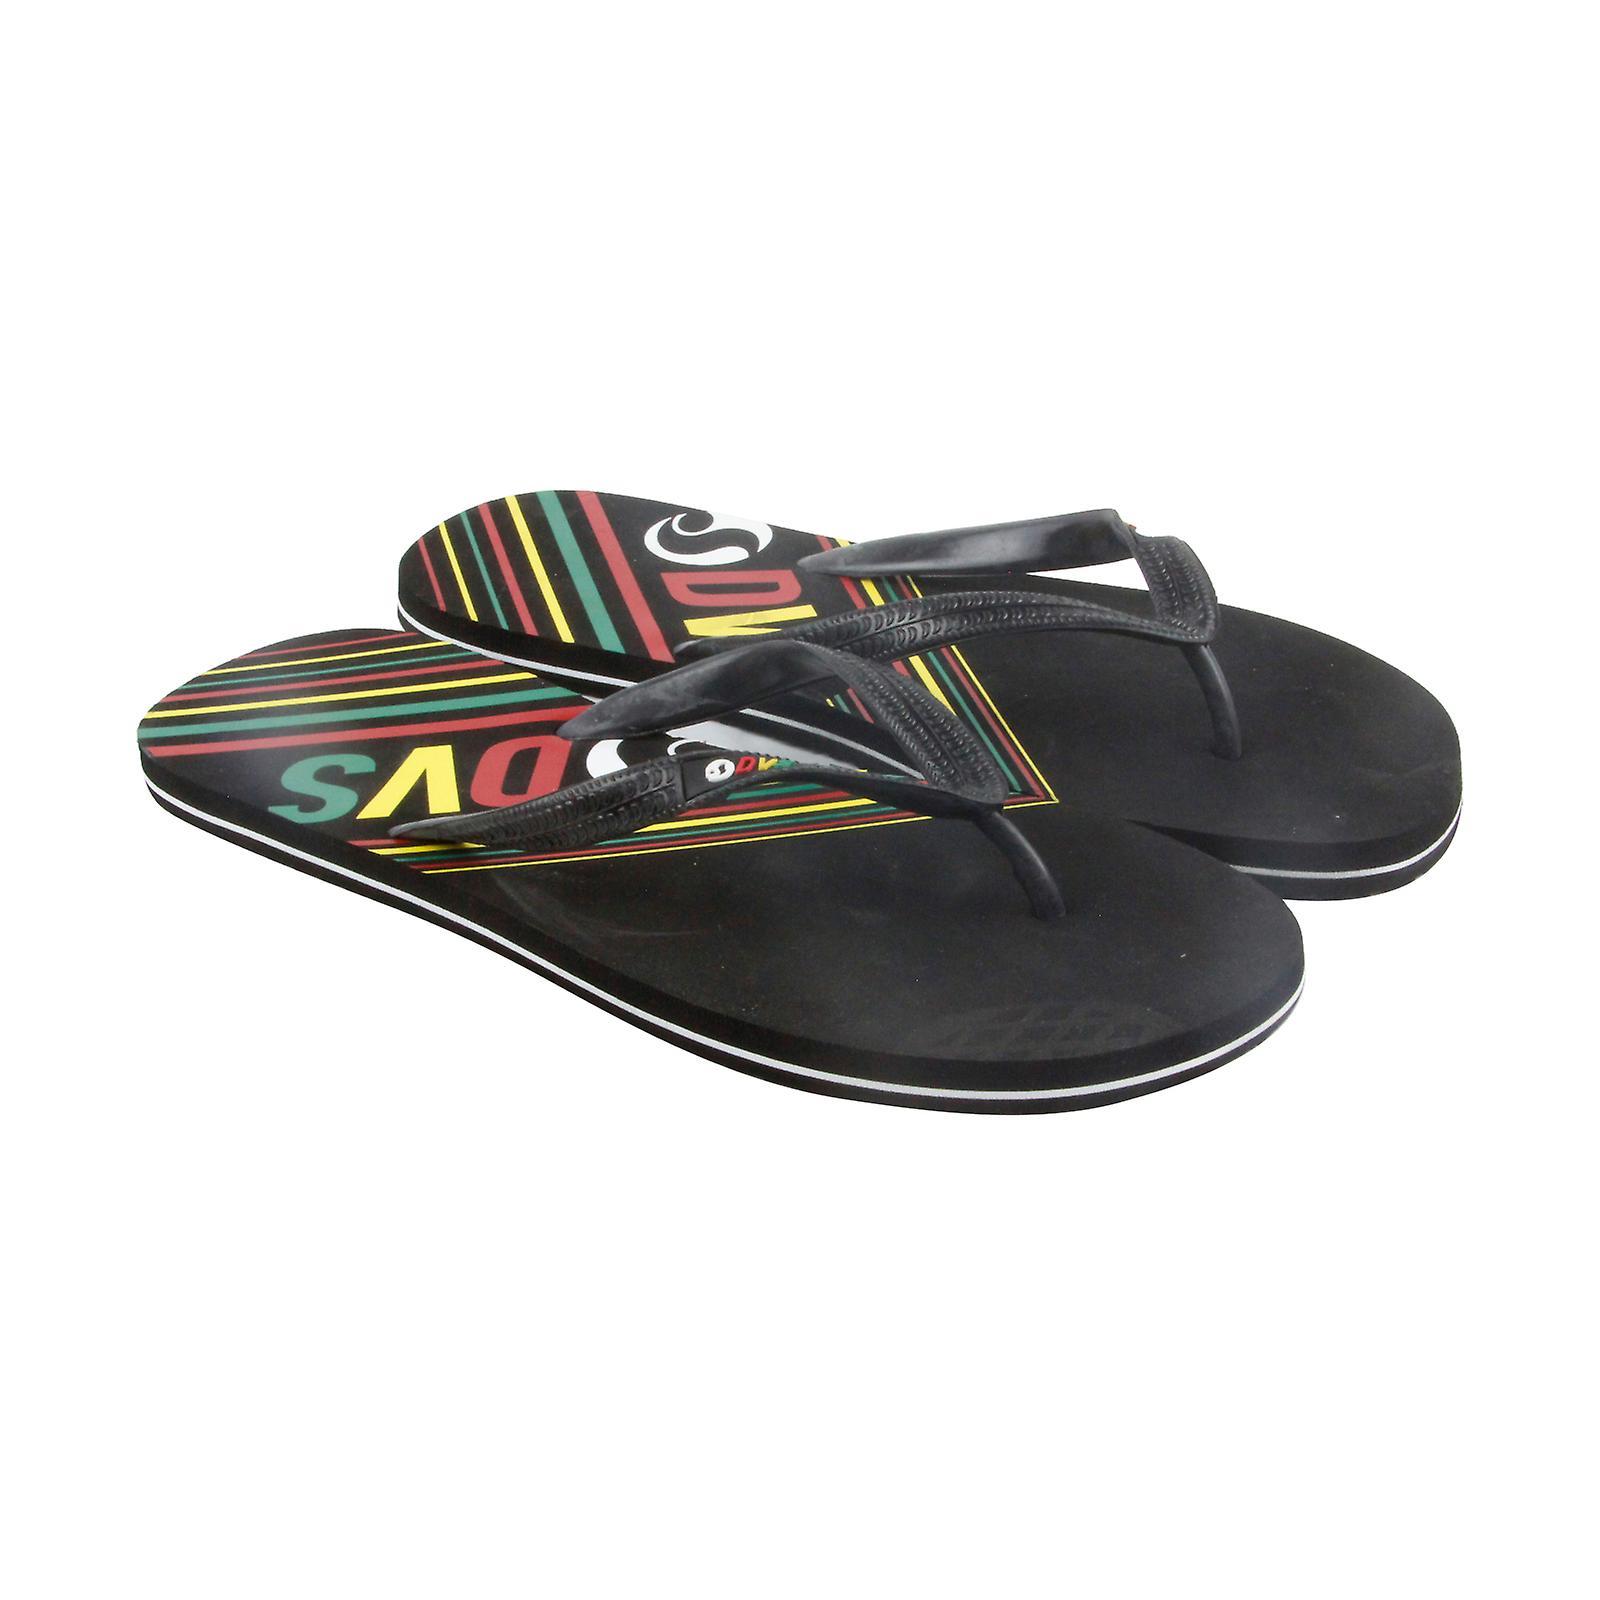 DVS Marbella On Mens Black Synthetic Slip On Marbella Flip Flops Sandals Shoes b45b62